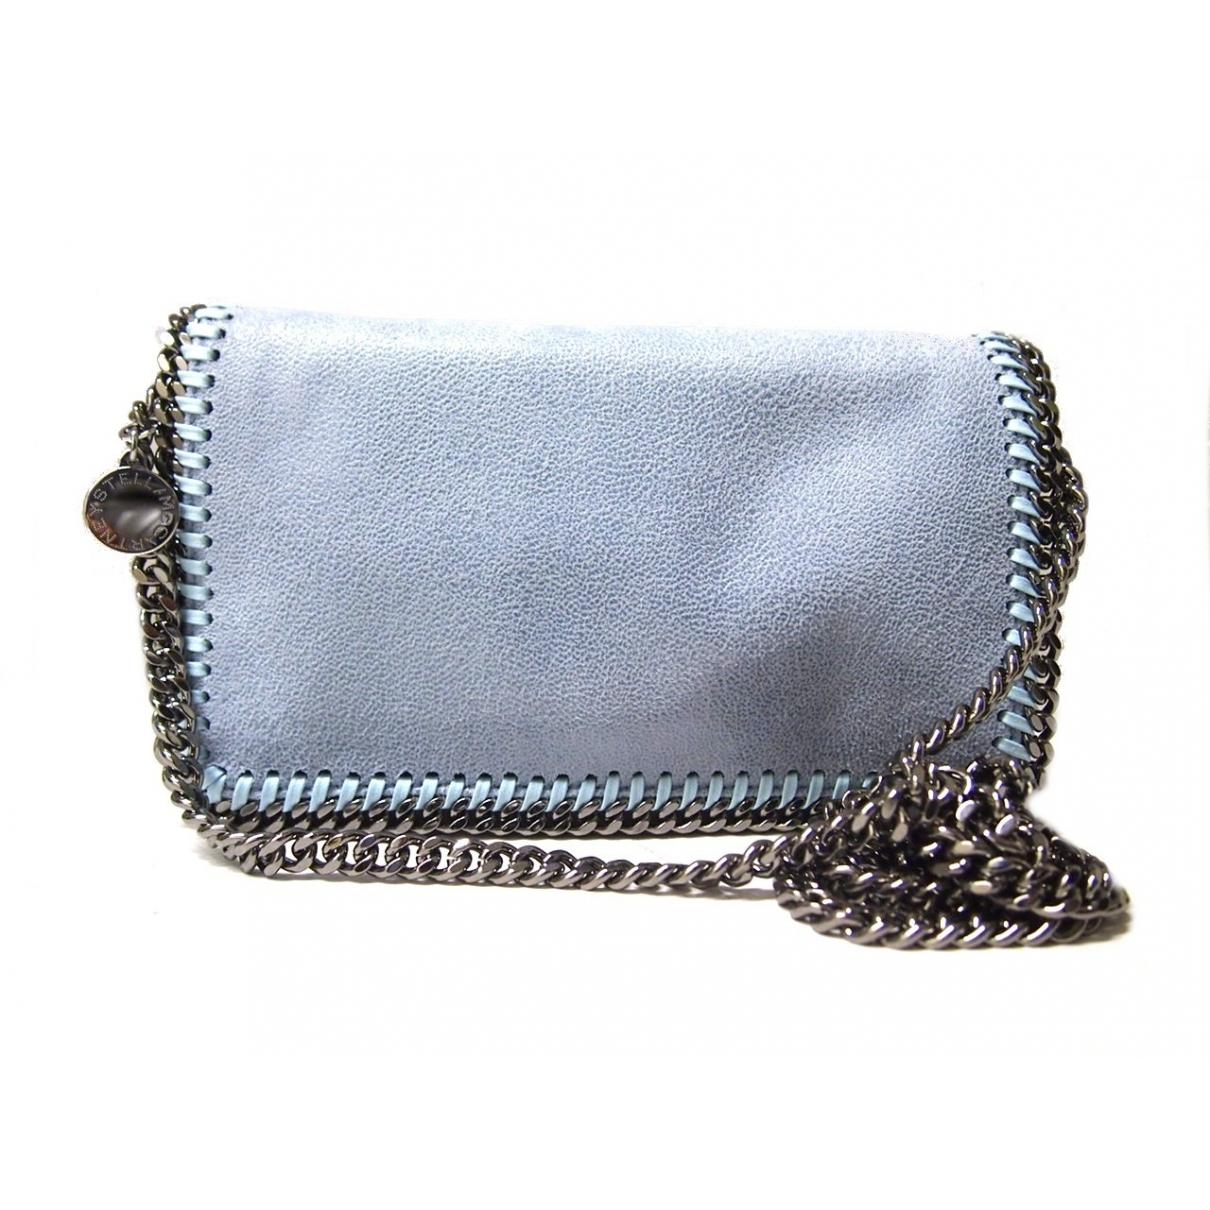 Bolsos clutch Falabella en Sintetico Azul Stella Mccartney